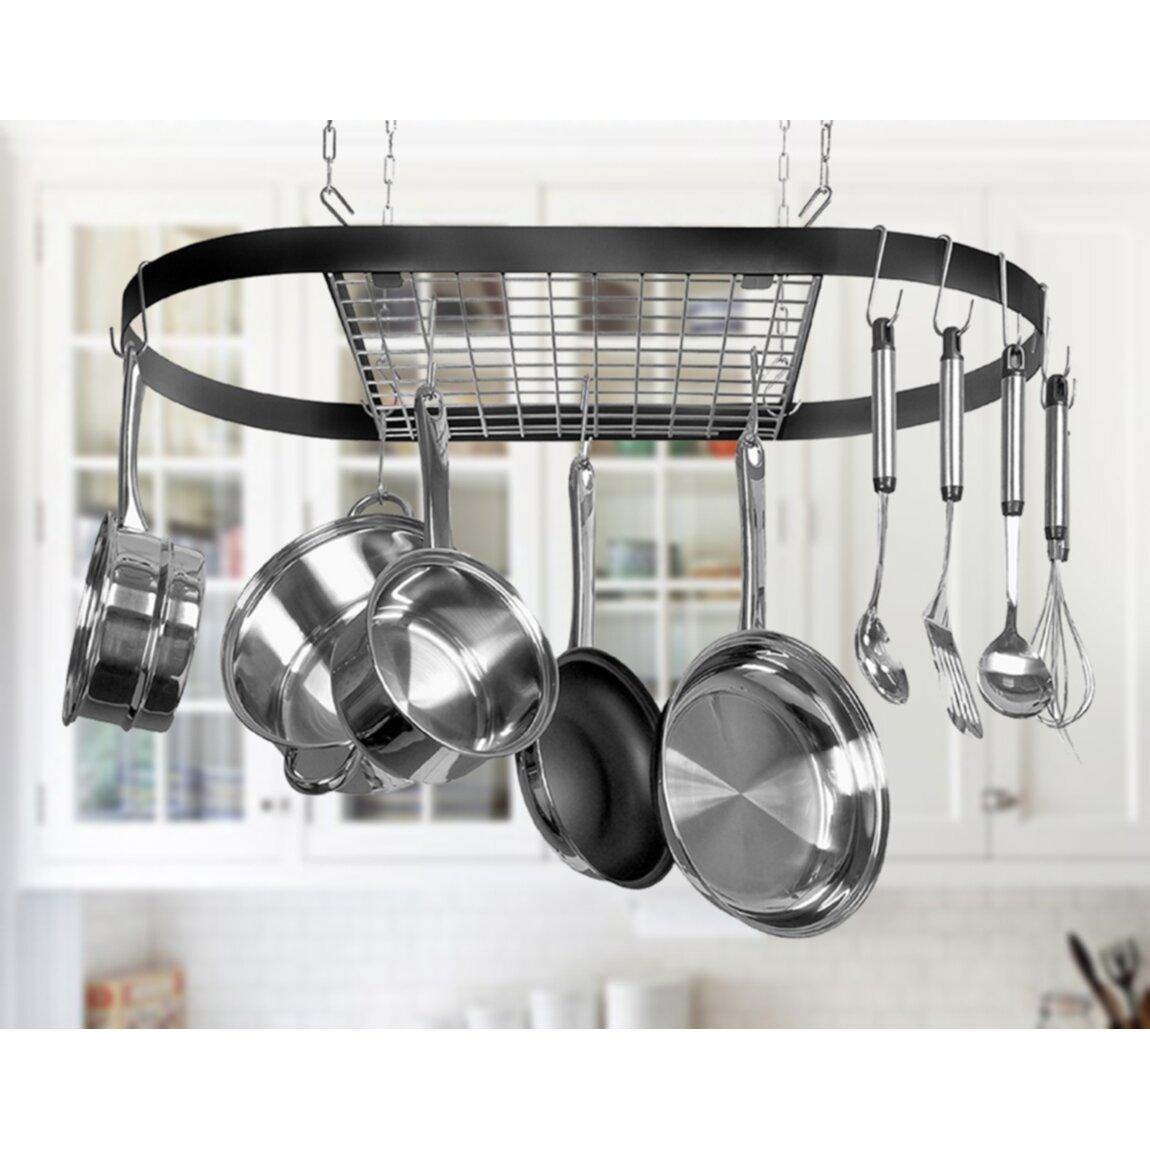 Kinetic Classicor Wrought Iron Hanging Oval Pot Rack